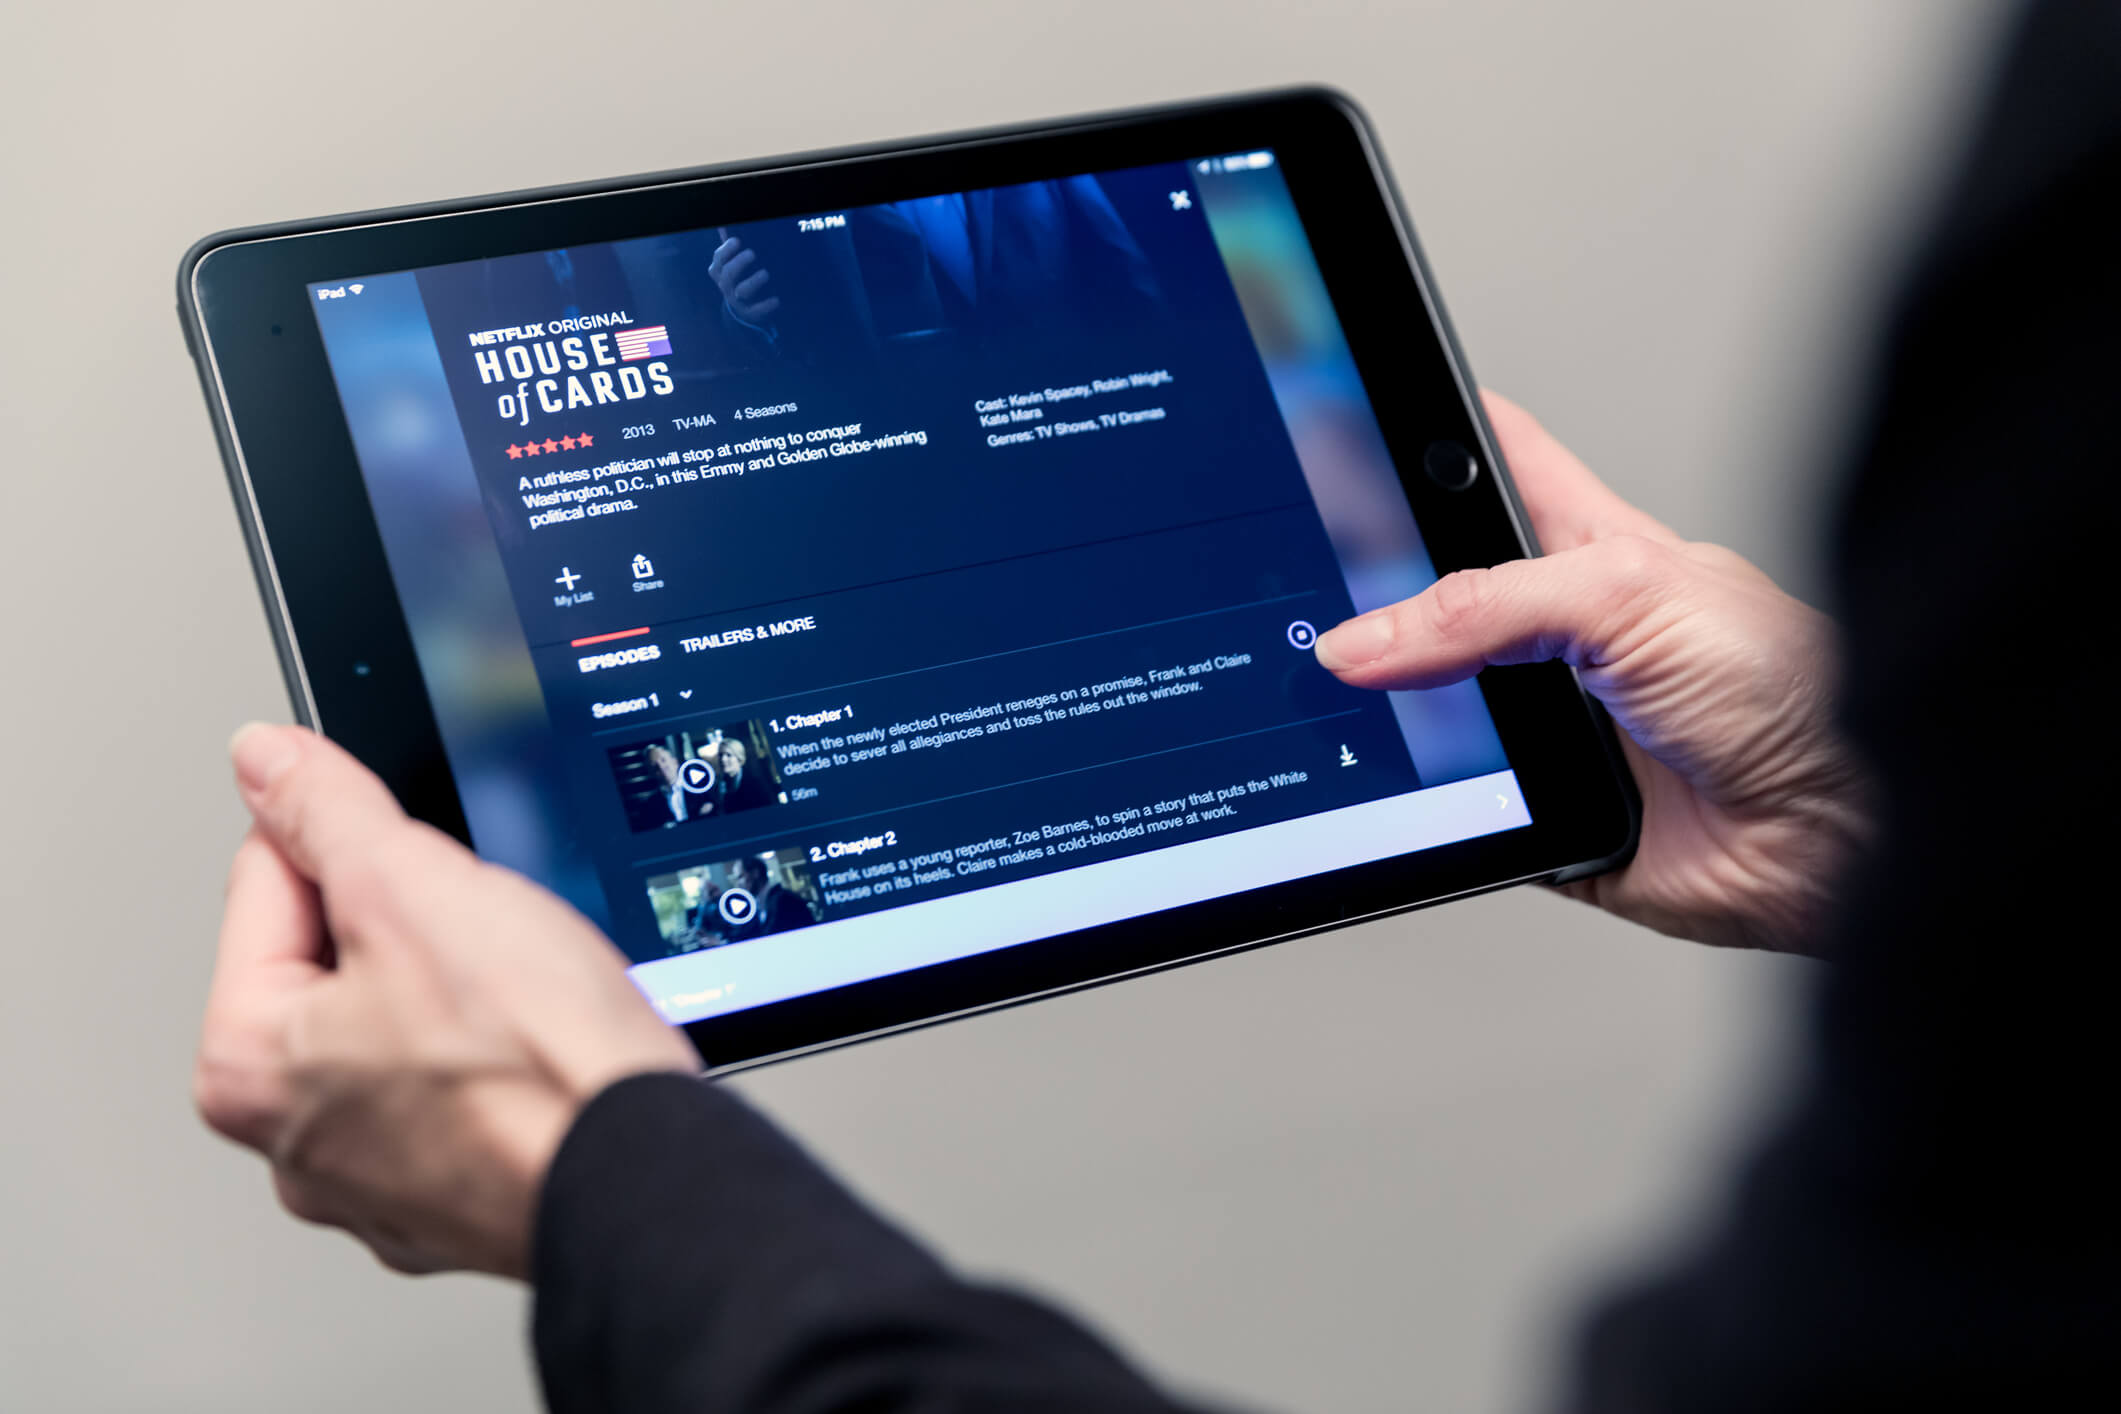 Netflix on a handheld tablet